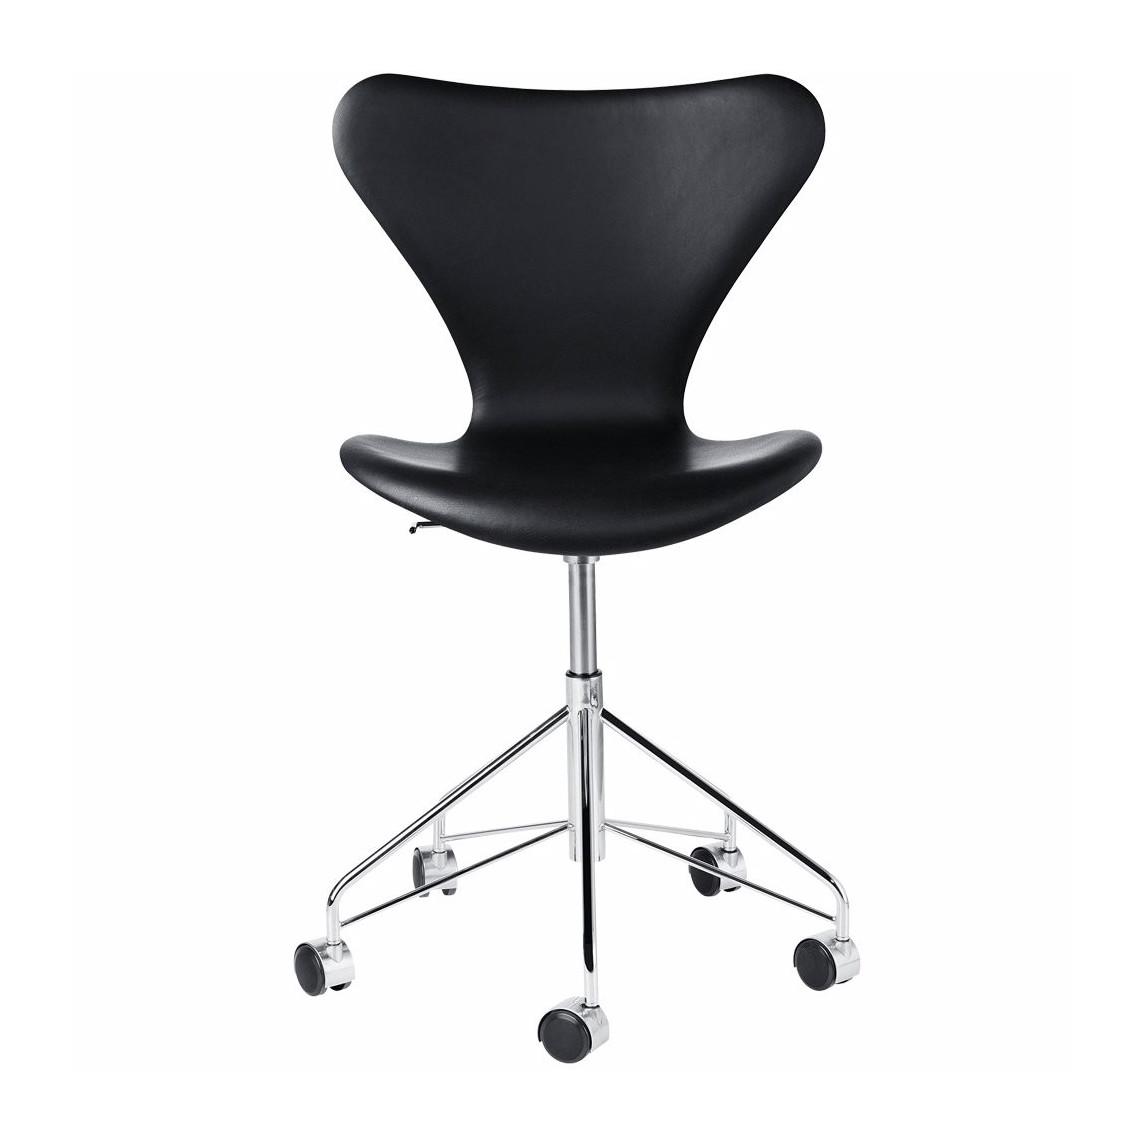 Serie 7™ Snurrstol, basic leather svart